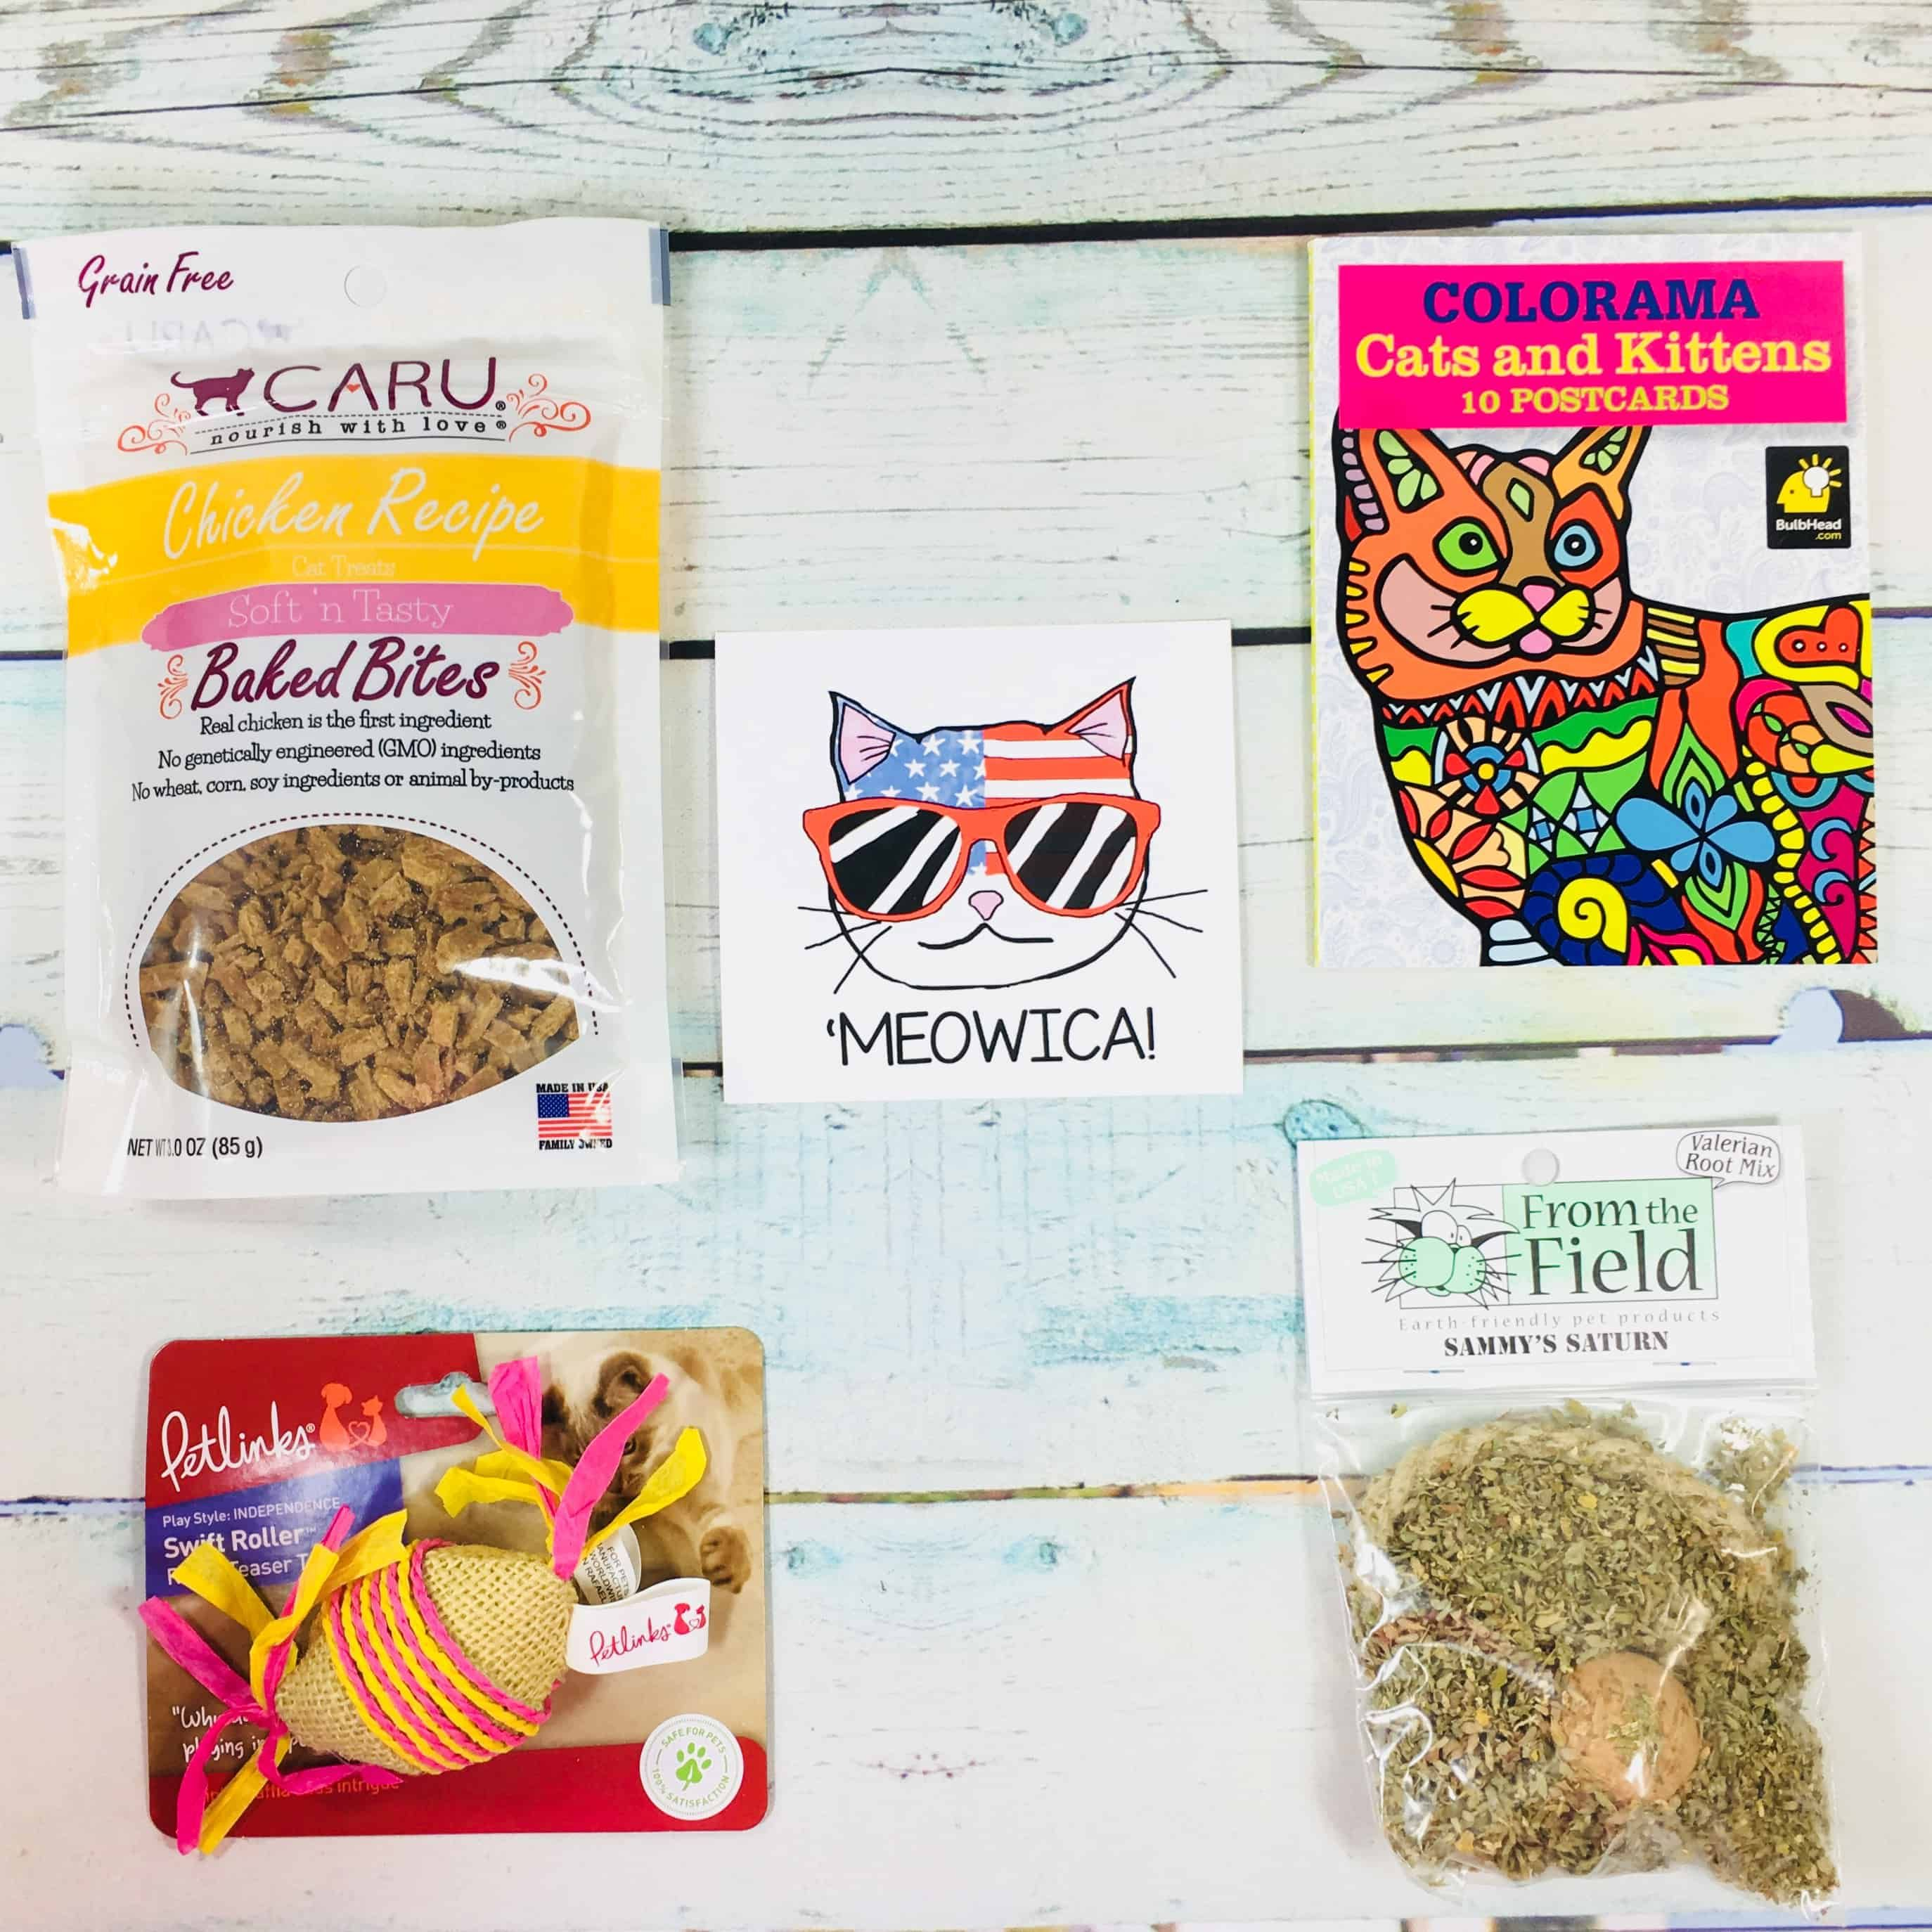 Pet Treater Cat Pack Subscription boxes, Pets, Cat toys